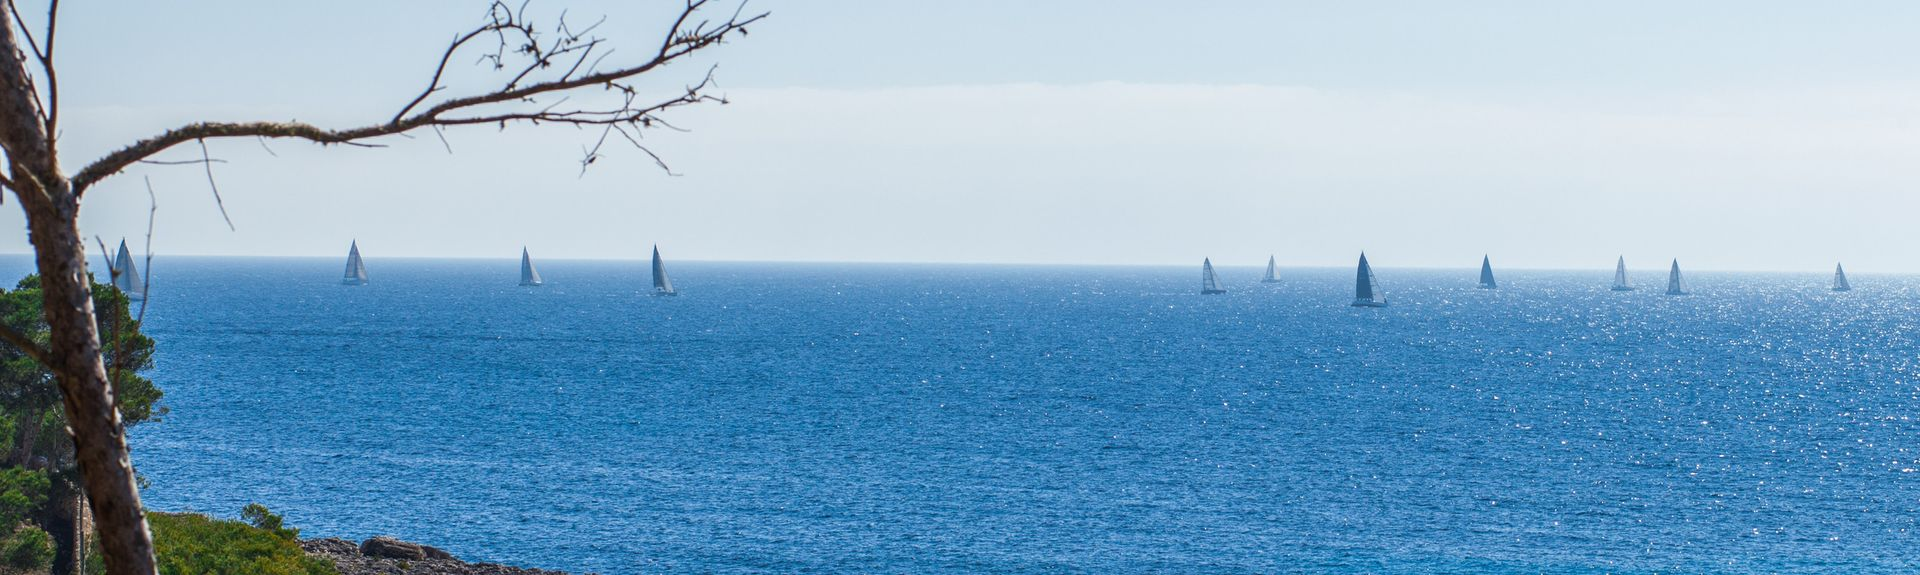 S'alqueria Blanca, Santanyi, Balearic Islands, Spain